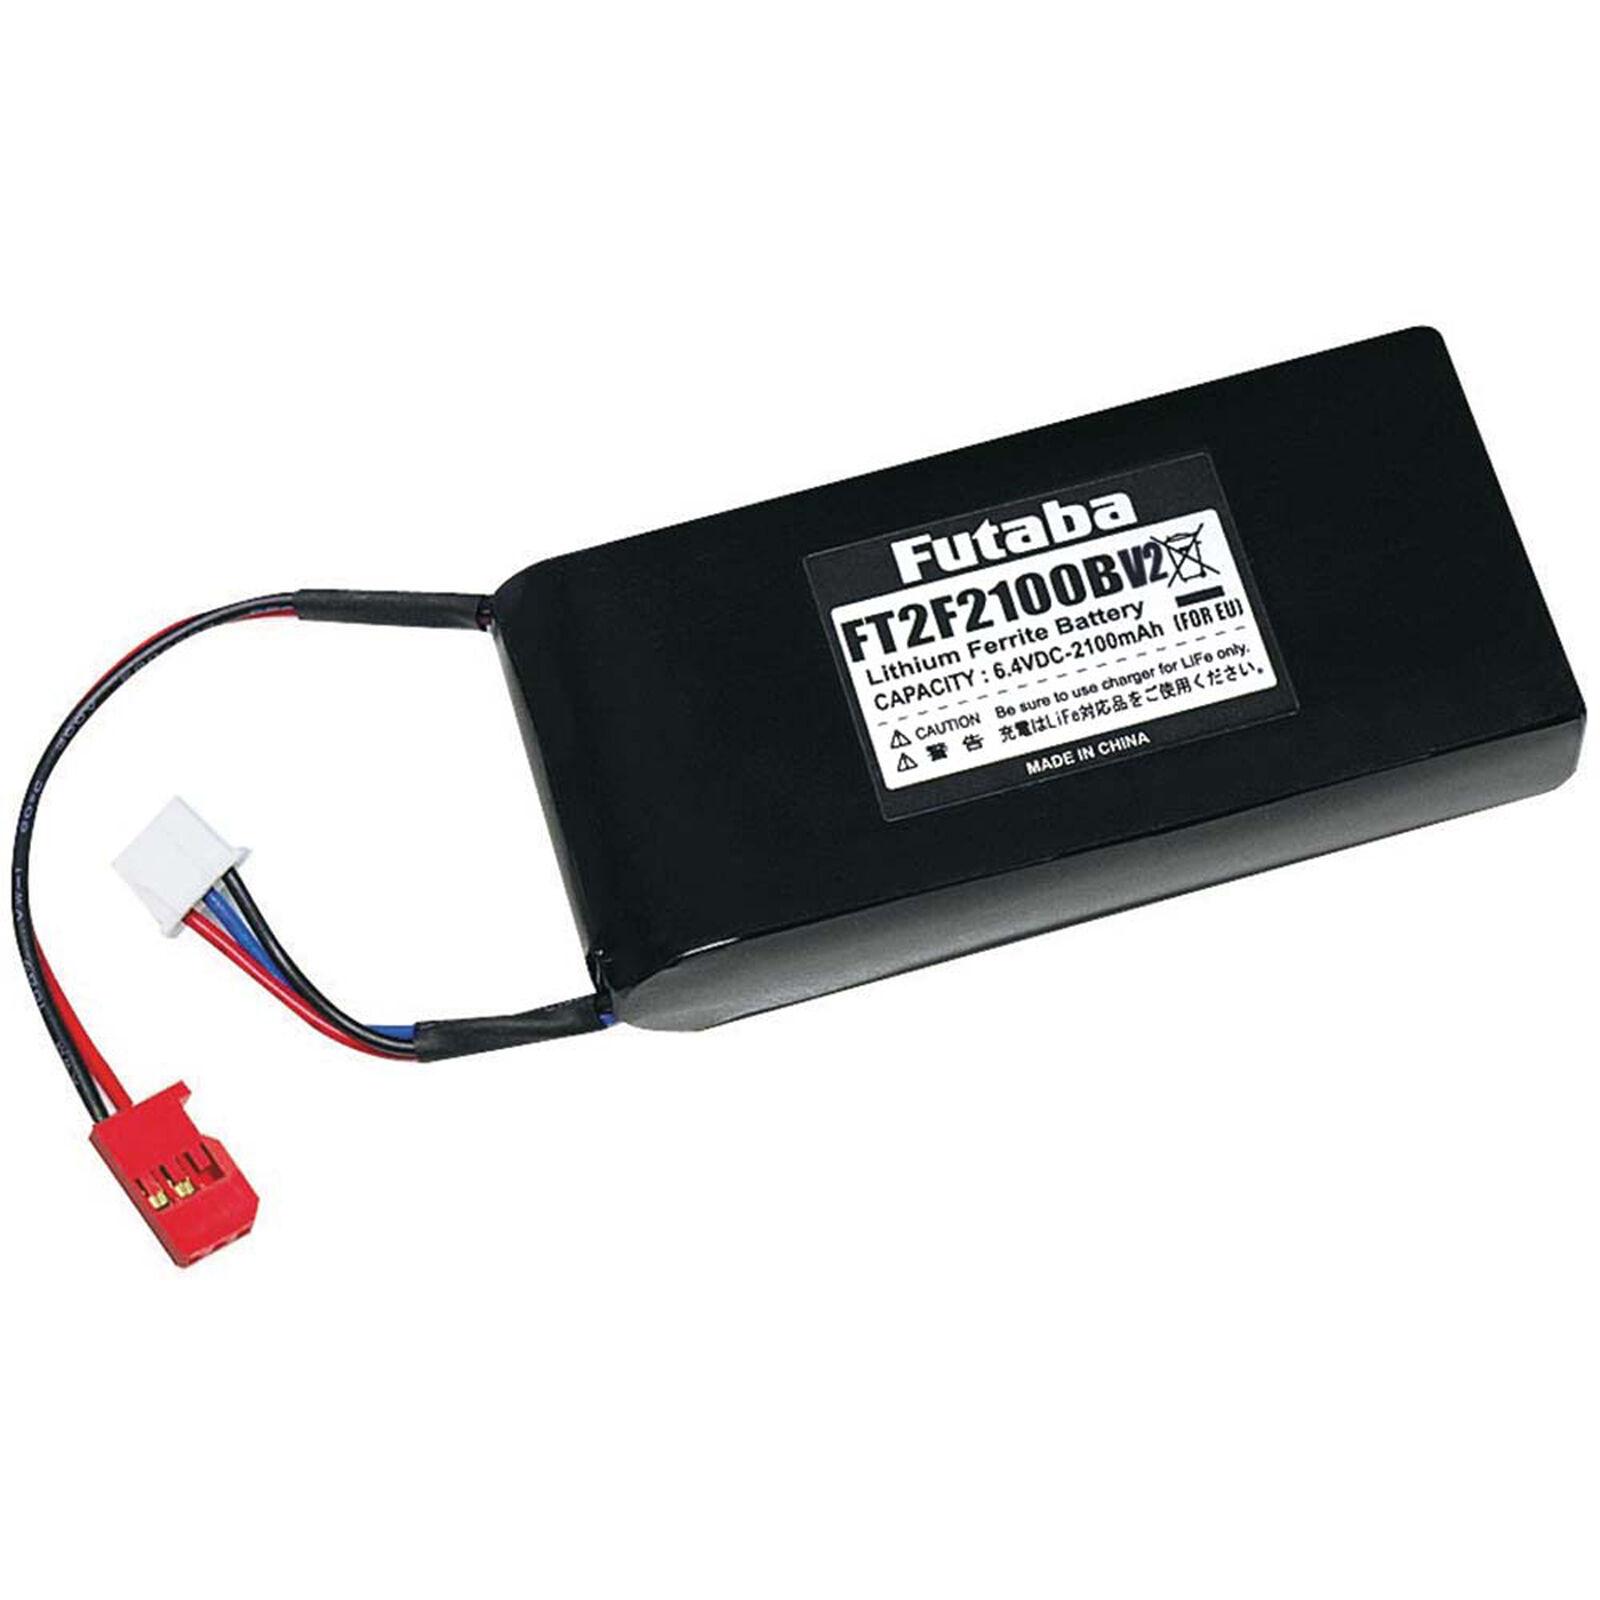 LiFe Battery 6.6V 2100mAh 18SZ